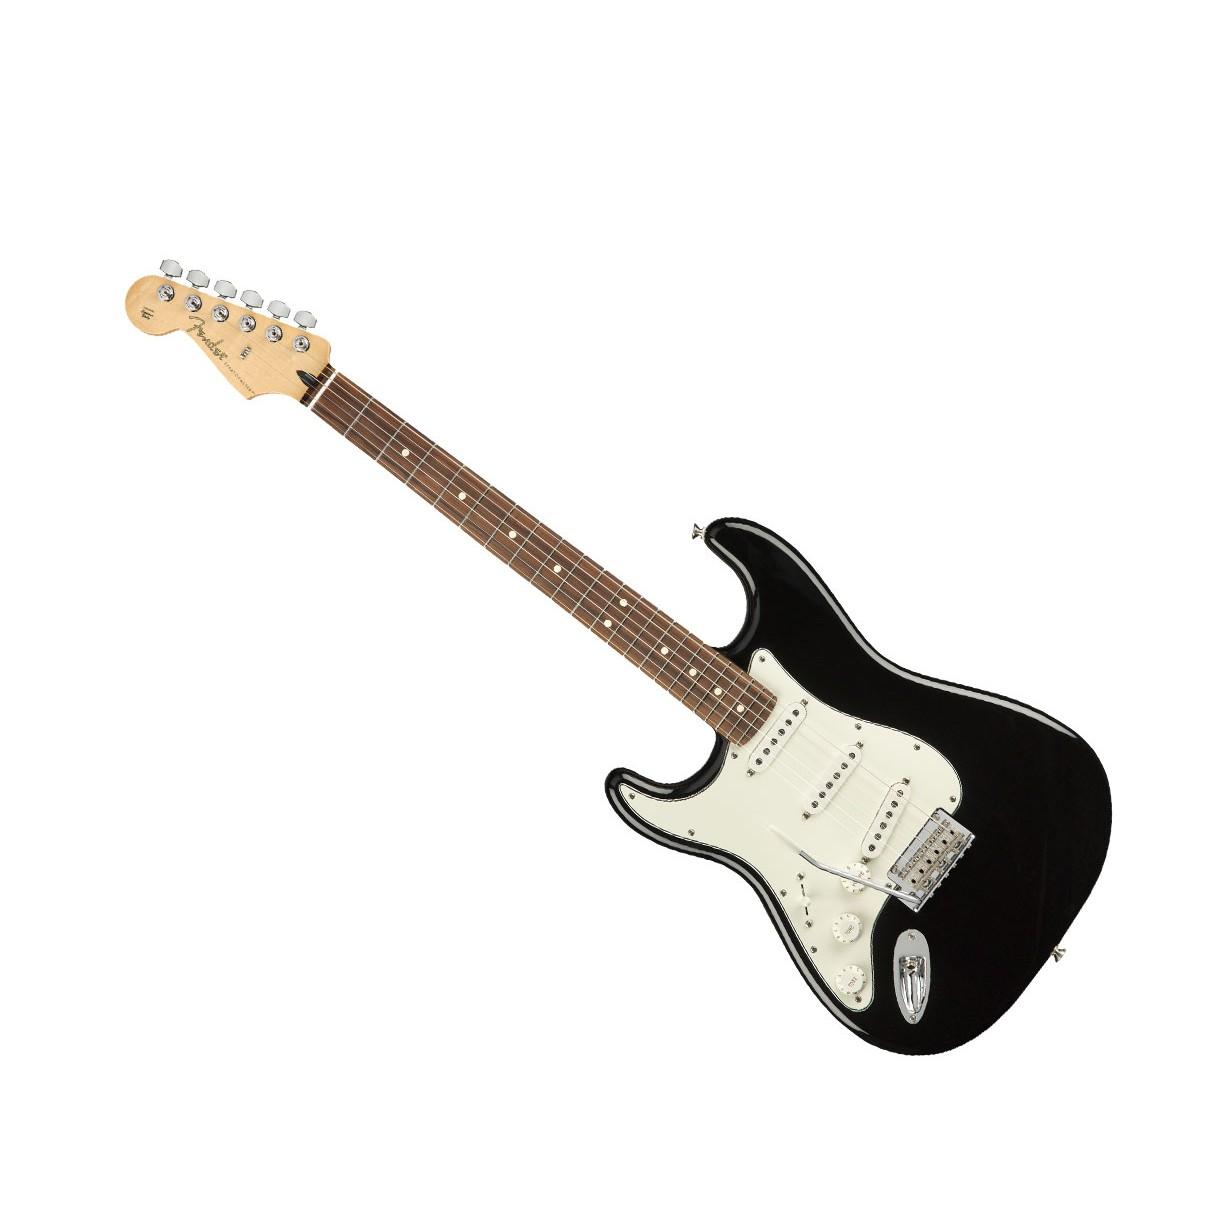 fender player stratocaster lh black w pau ferro fb fender g g dlx hard case. Black Bedroom Furniture Sets. Home Design Ideas